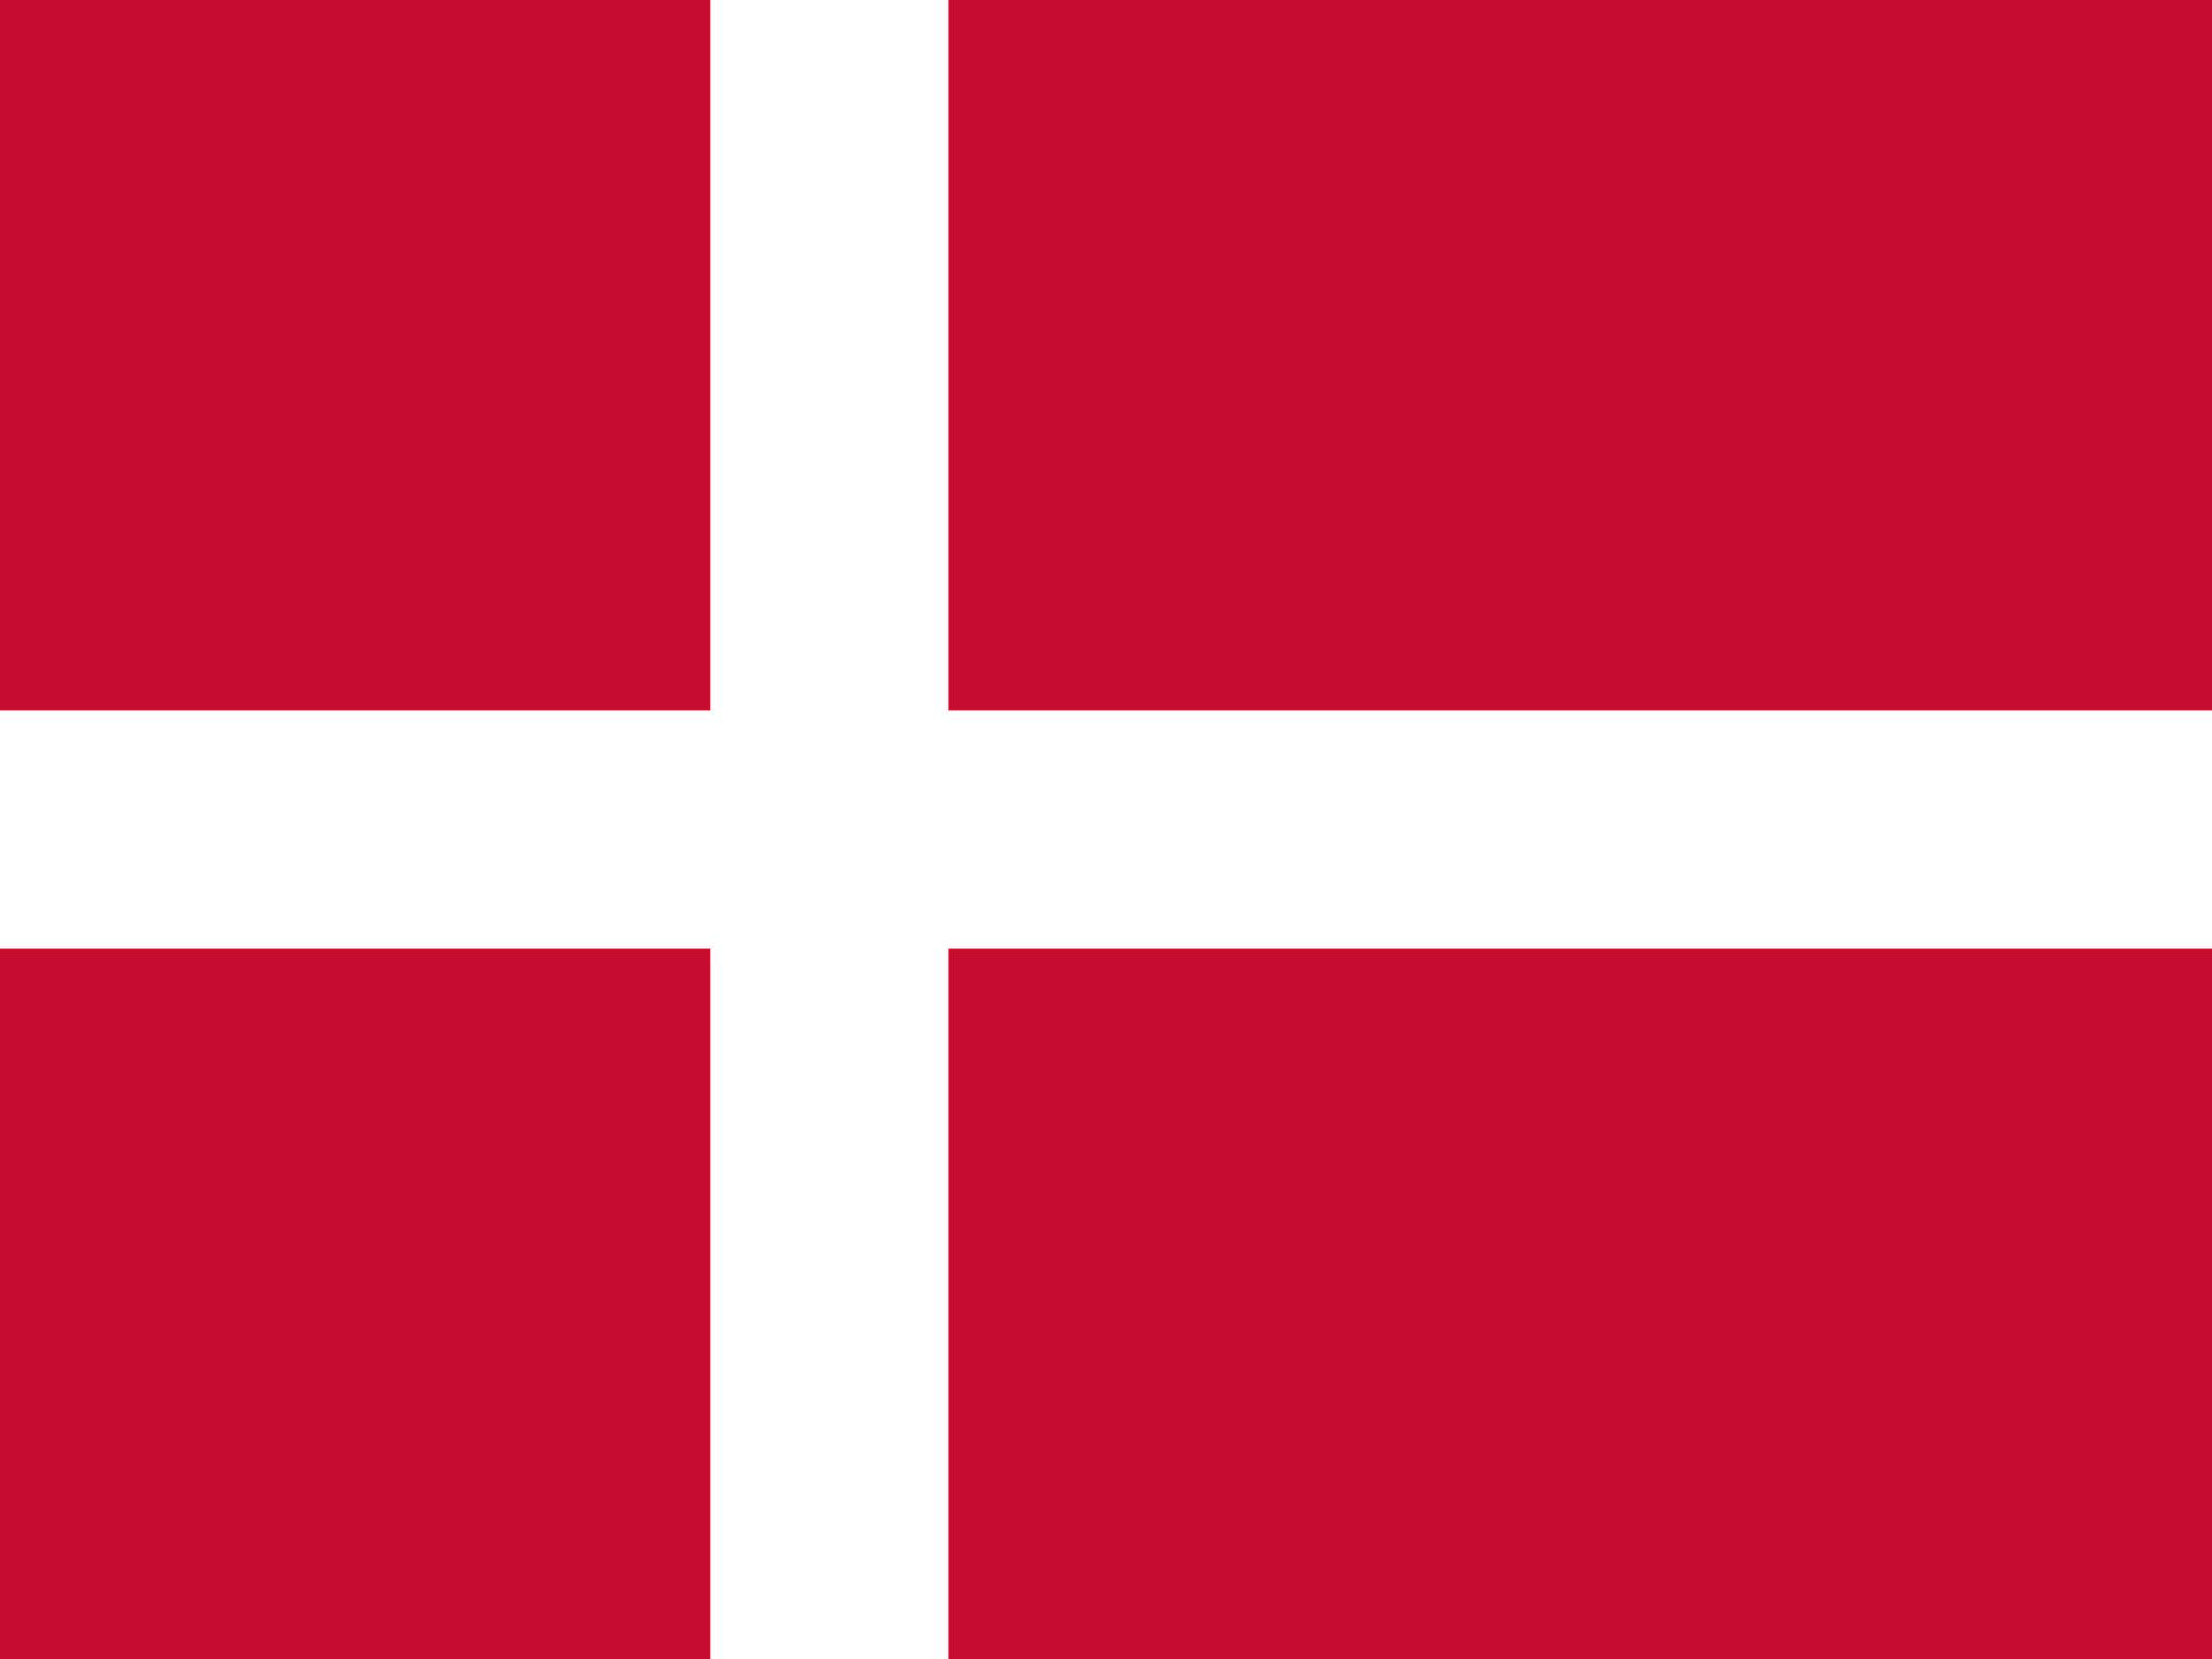 Copy of Denmark